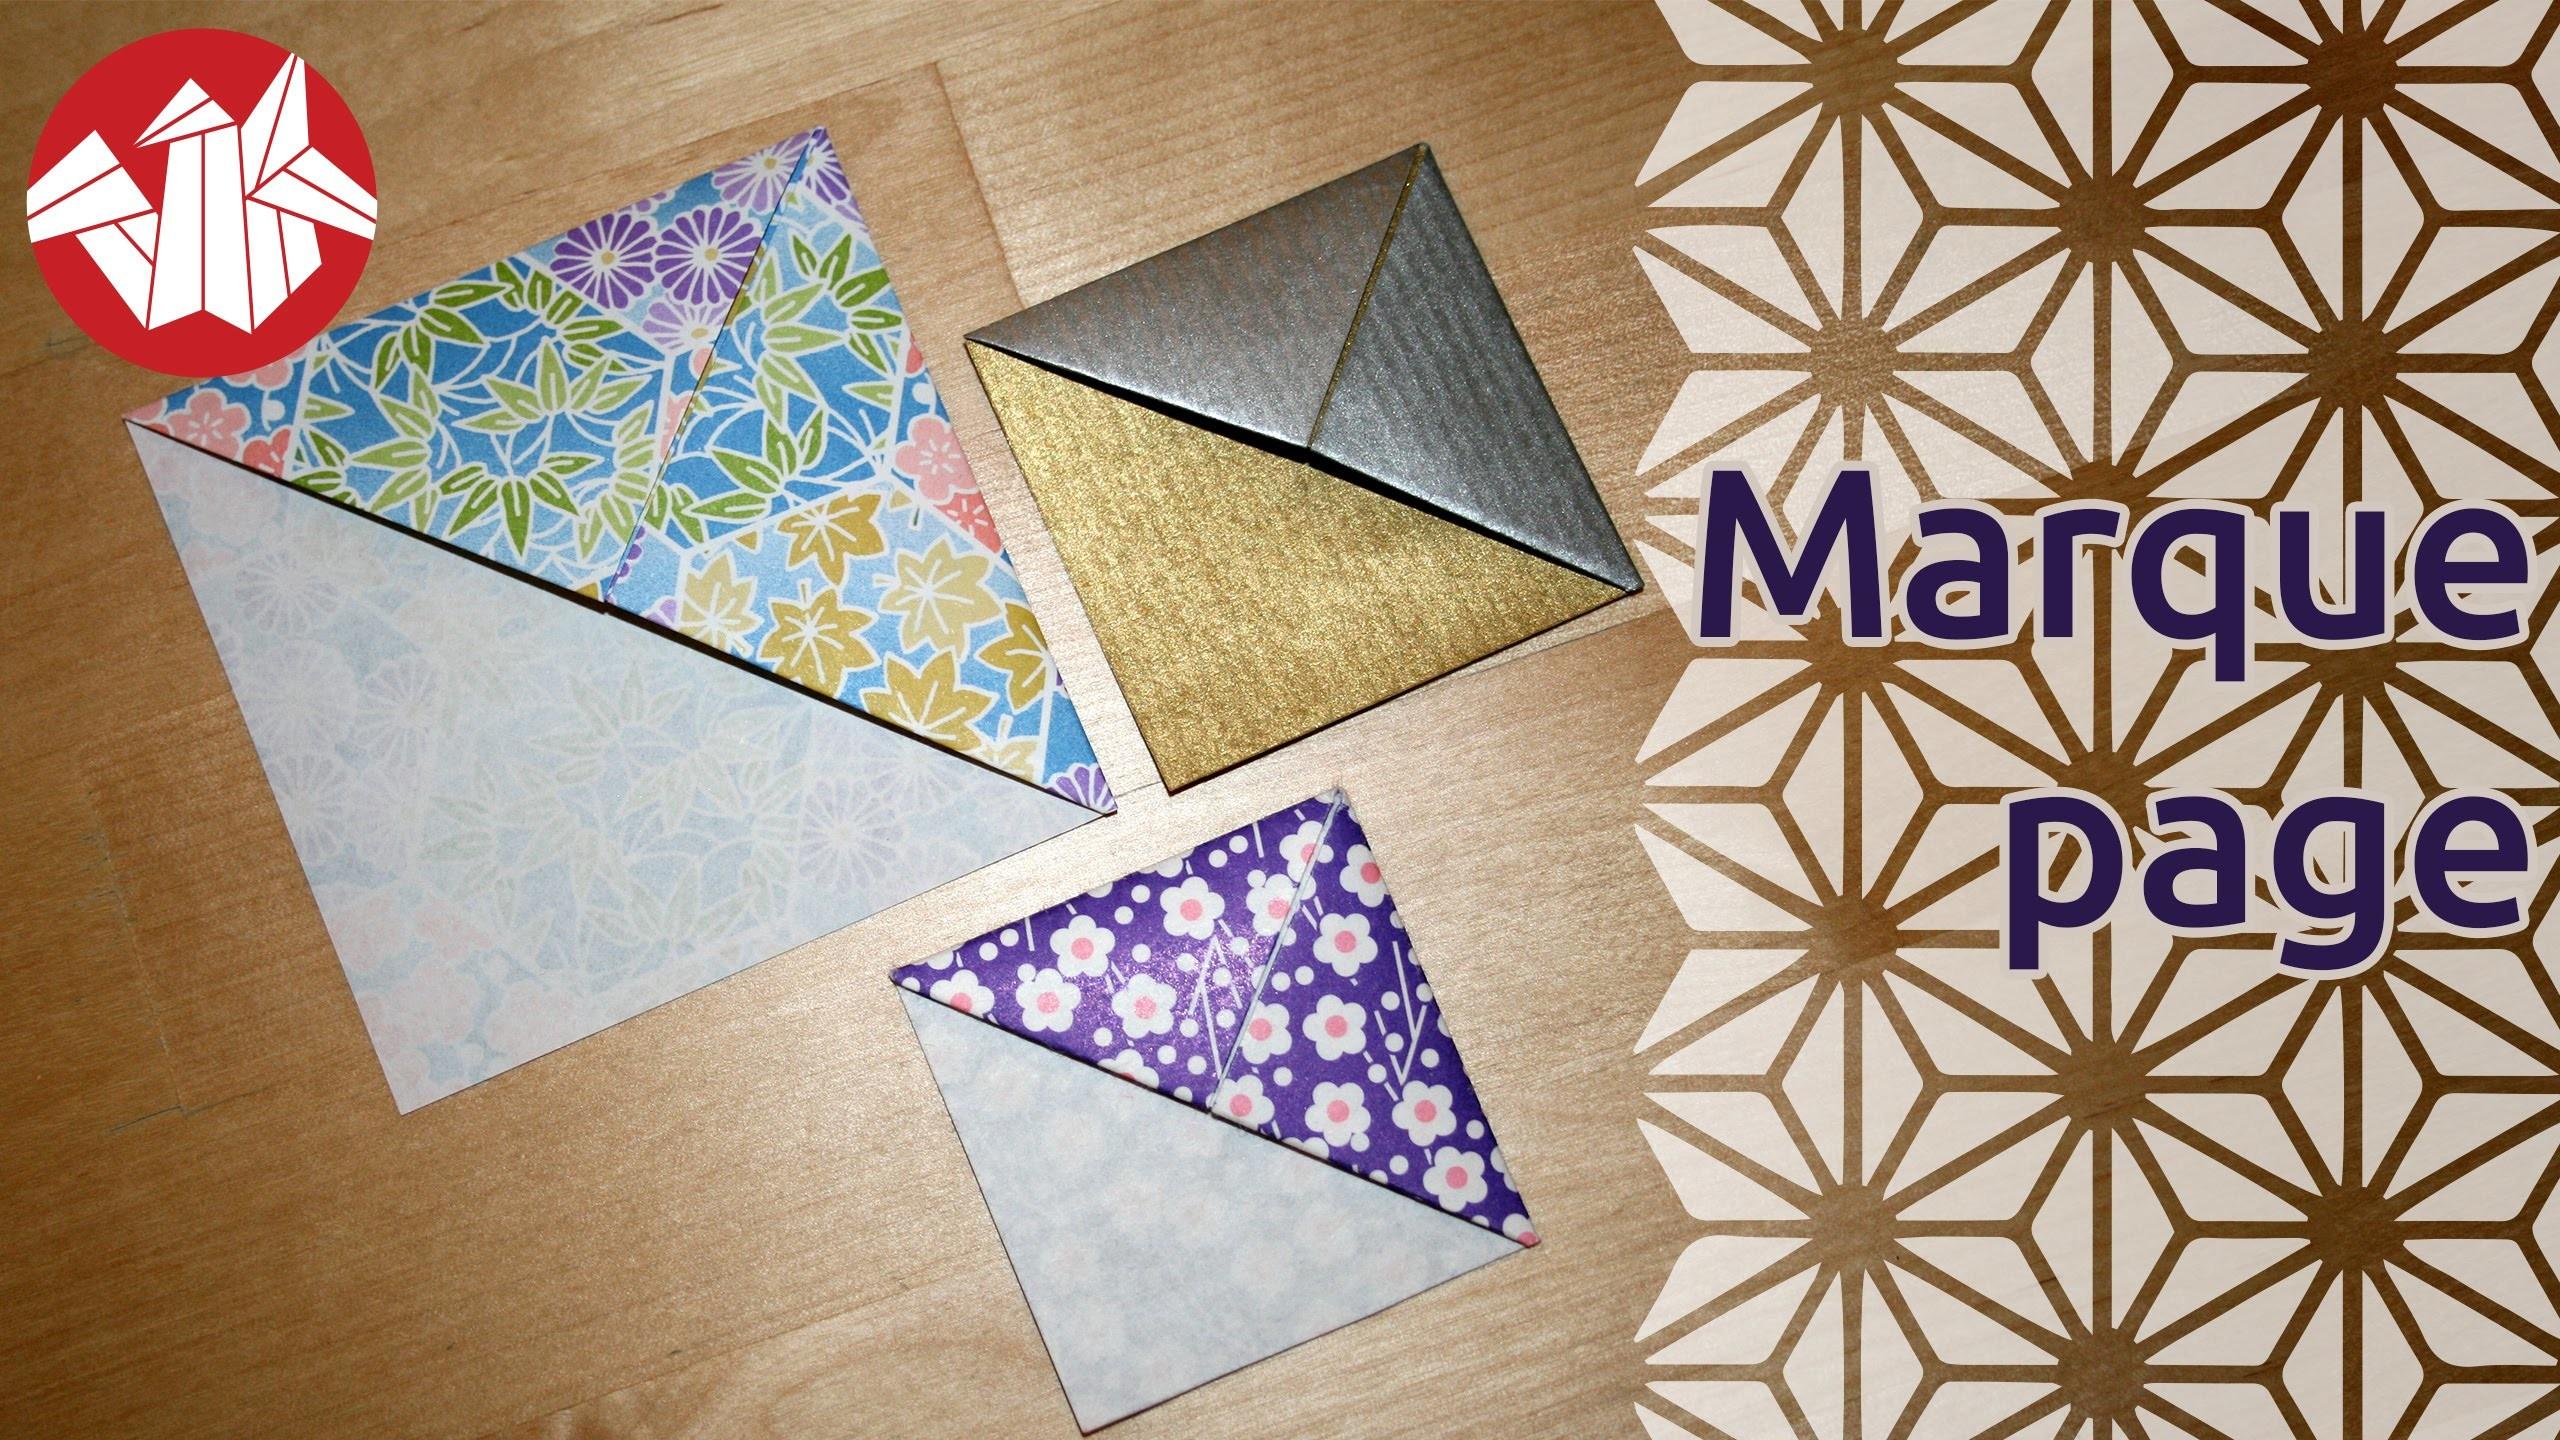 Origami - Marque-page - Bookmark [Senbazuru]